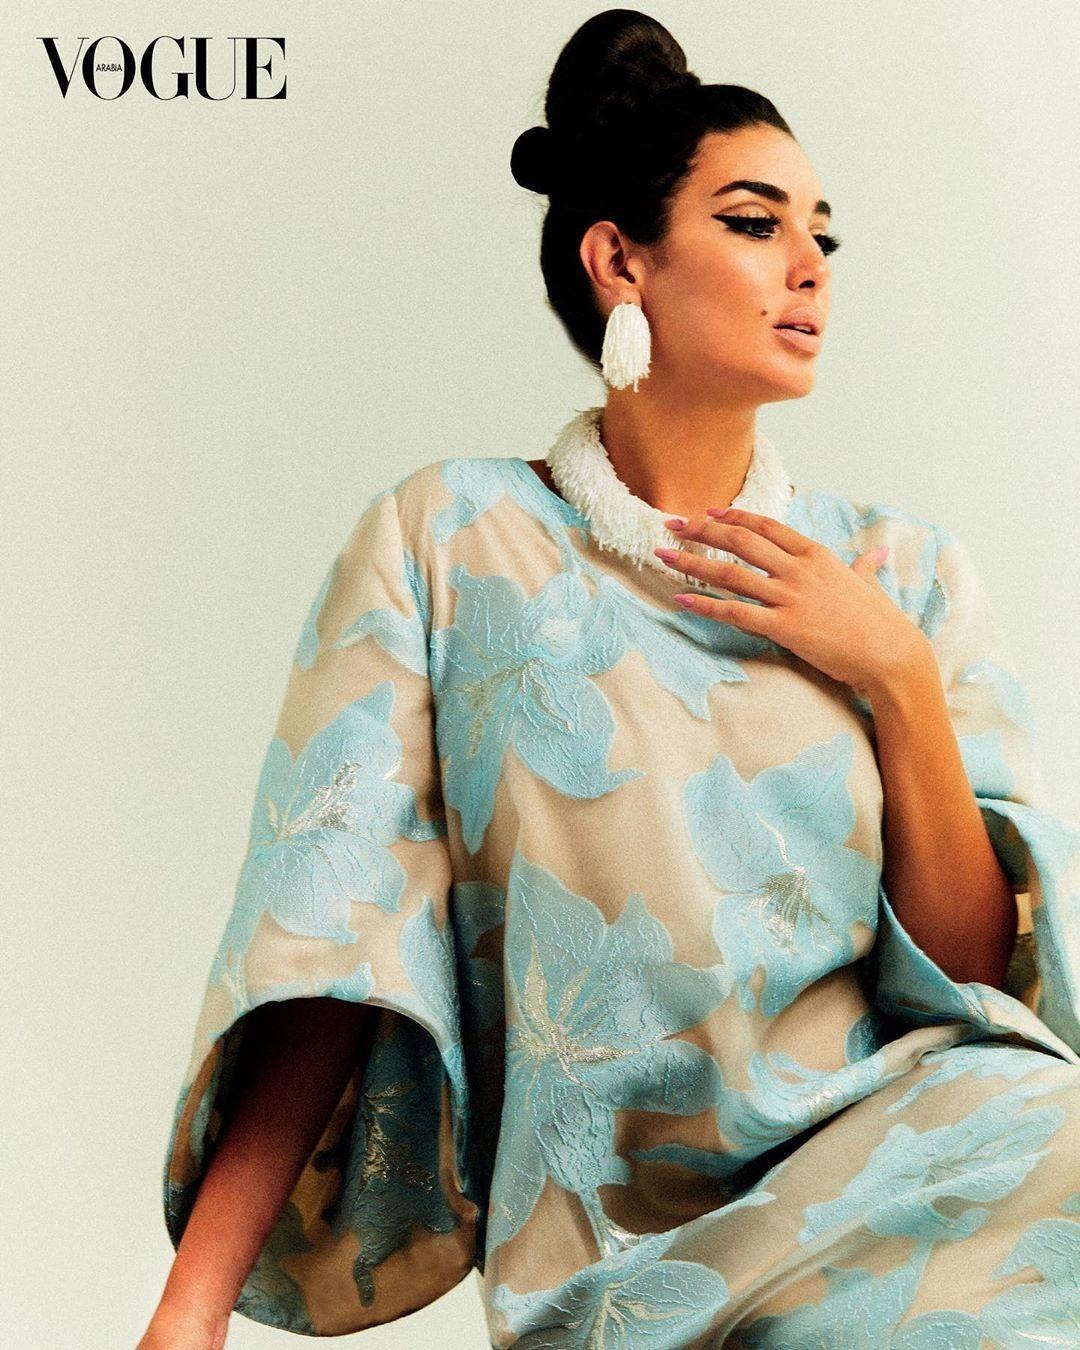 Vouge Covers Yasmin Sabry Egyptian Actress Egyptian Actress Women Women S Top